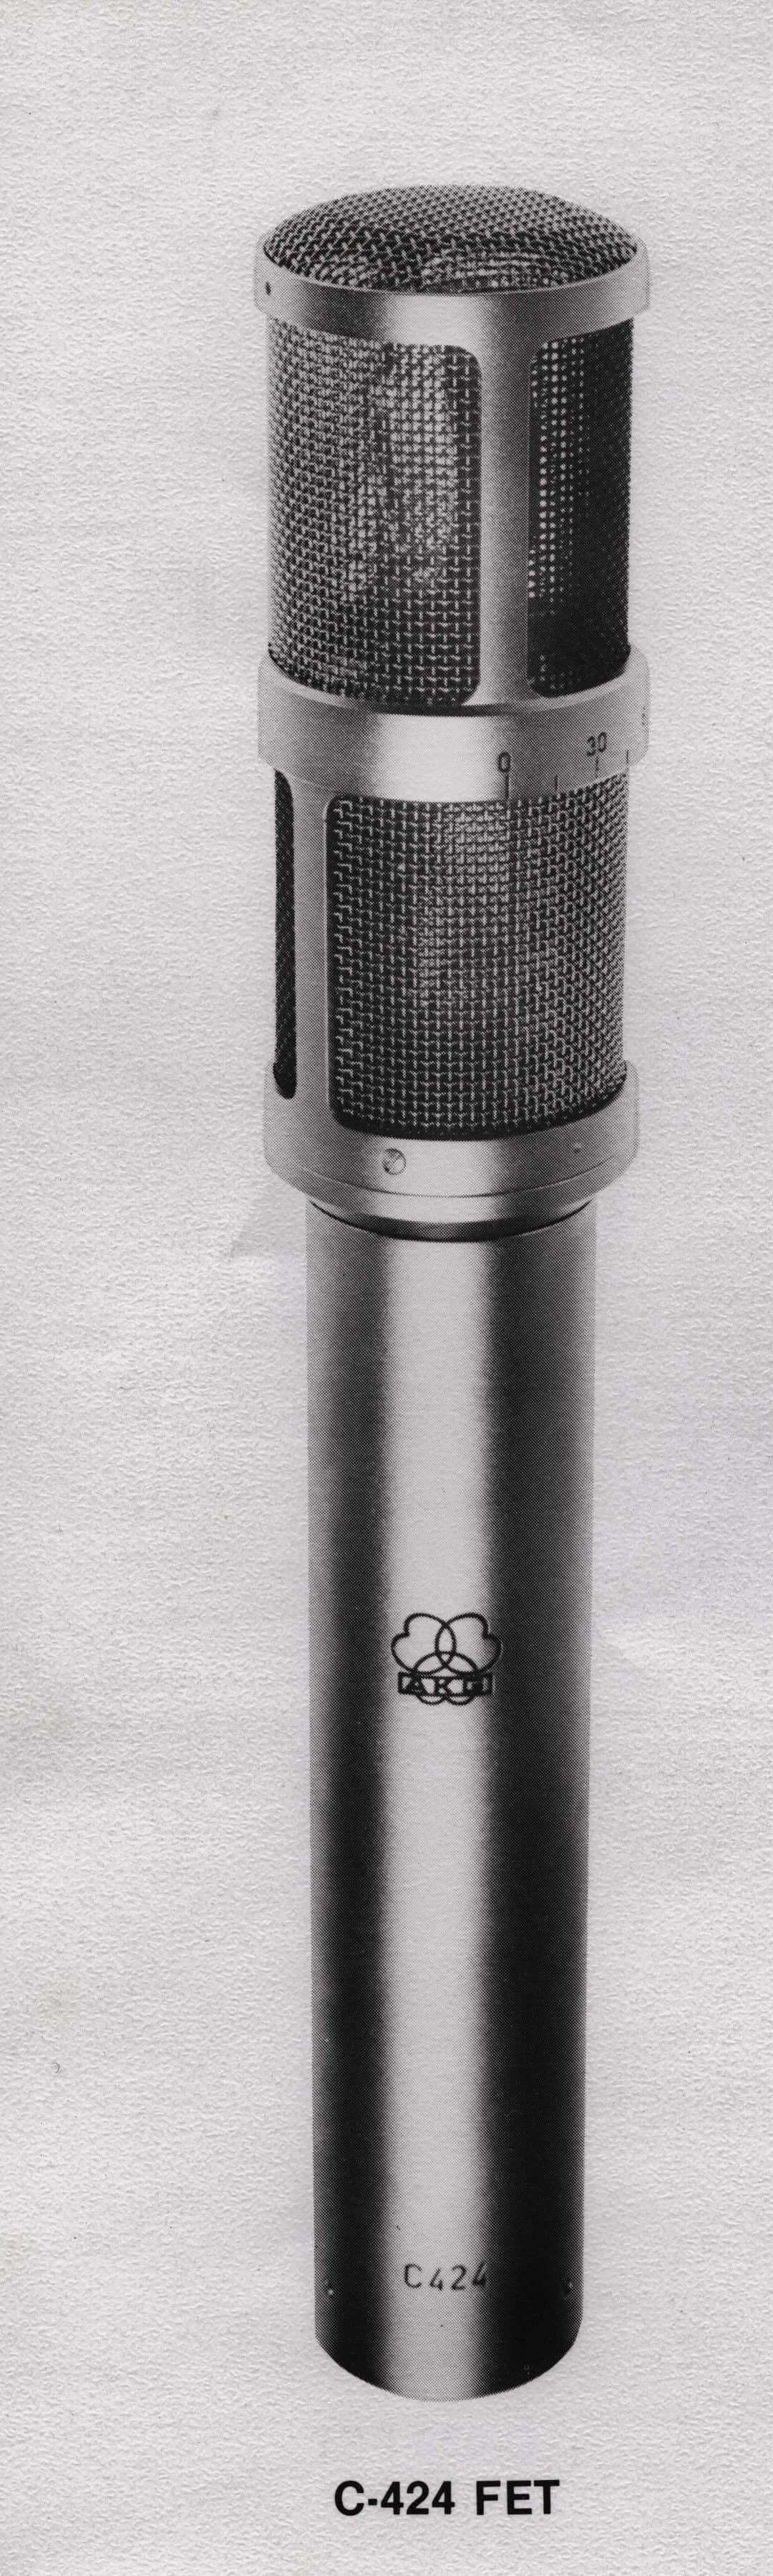 AKG C424 Quadraphonic Condenser Microphone